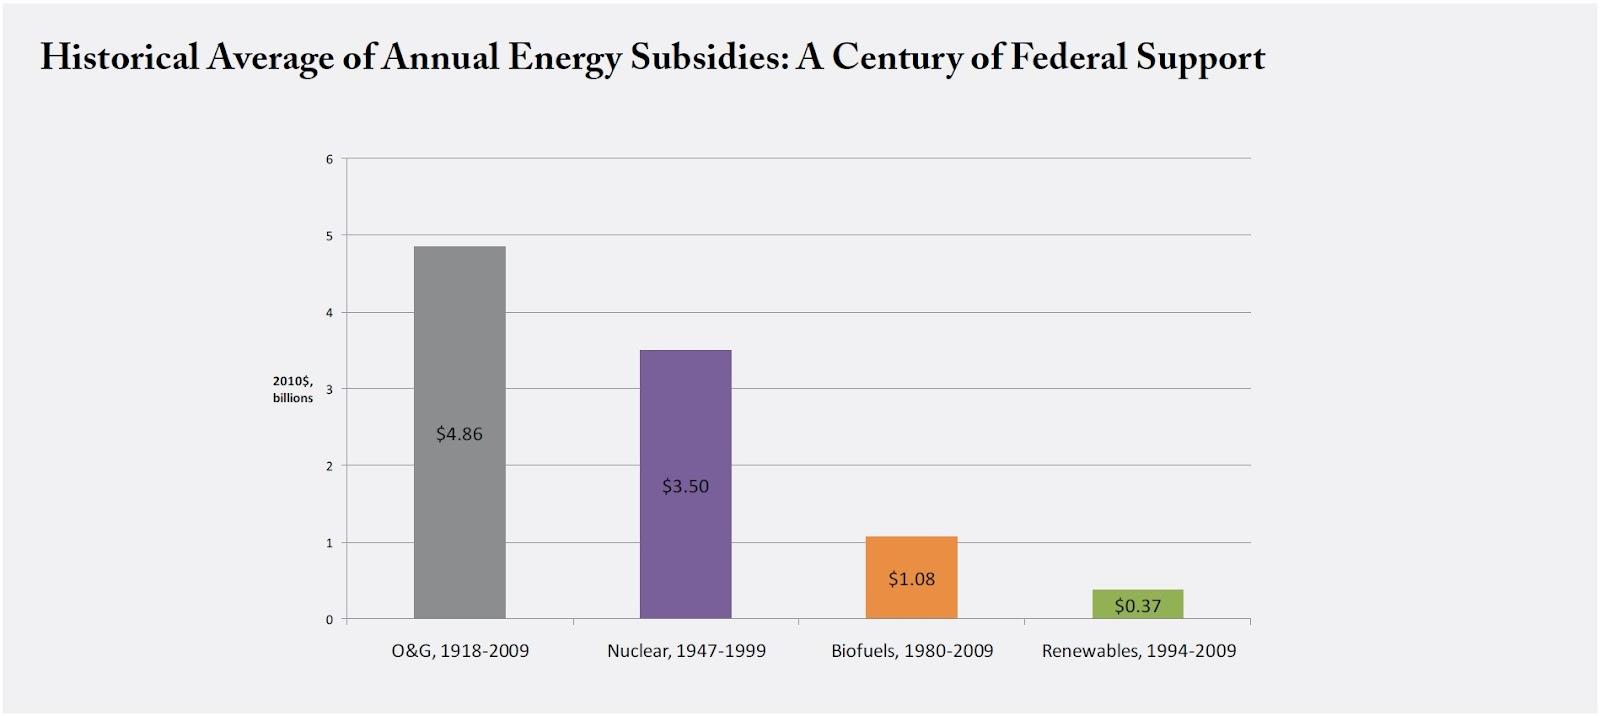 Subsidies image.jpg